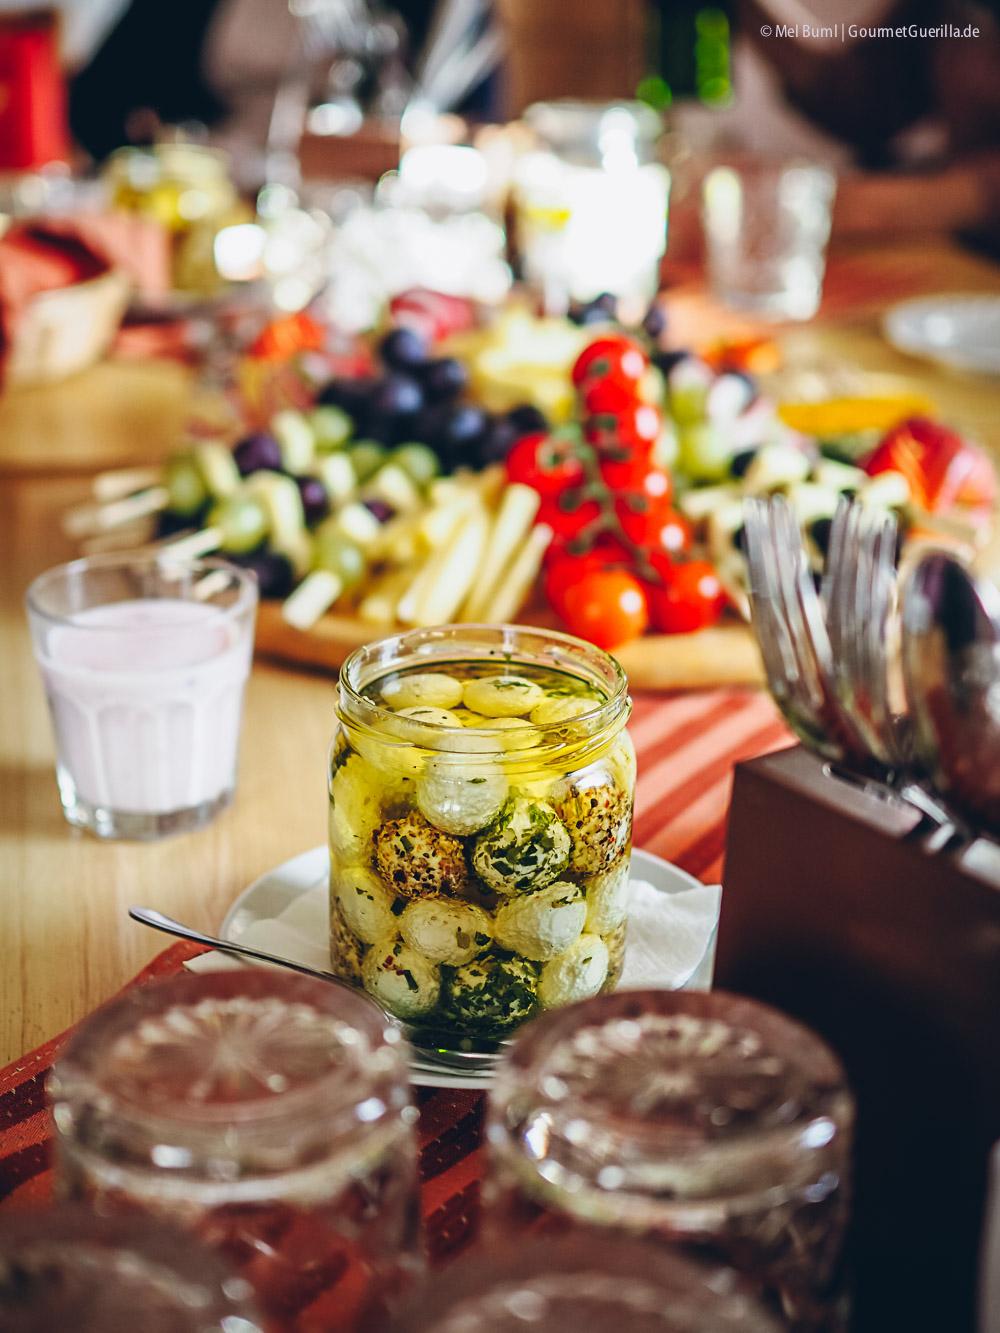 Slow Food Travel Gailtal Jörgishof und Pension |GourmetGuerilla.de